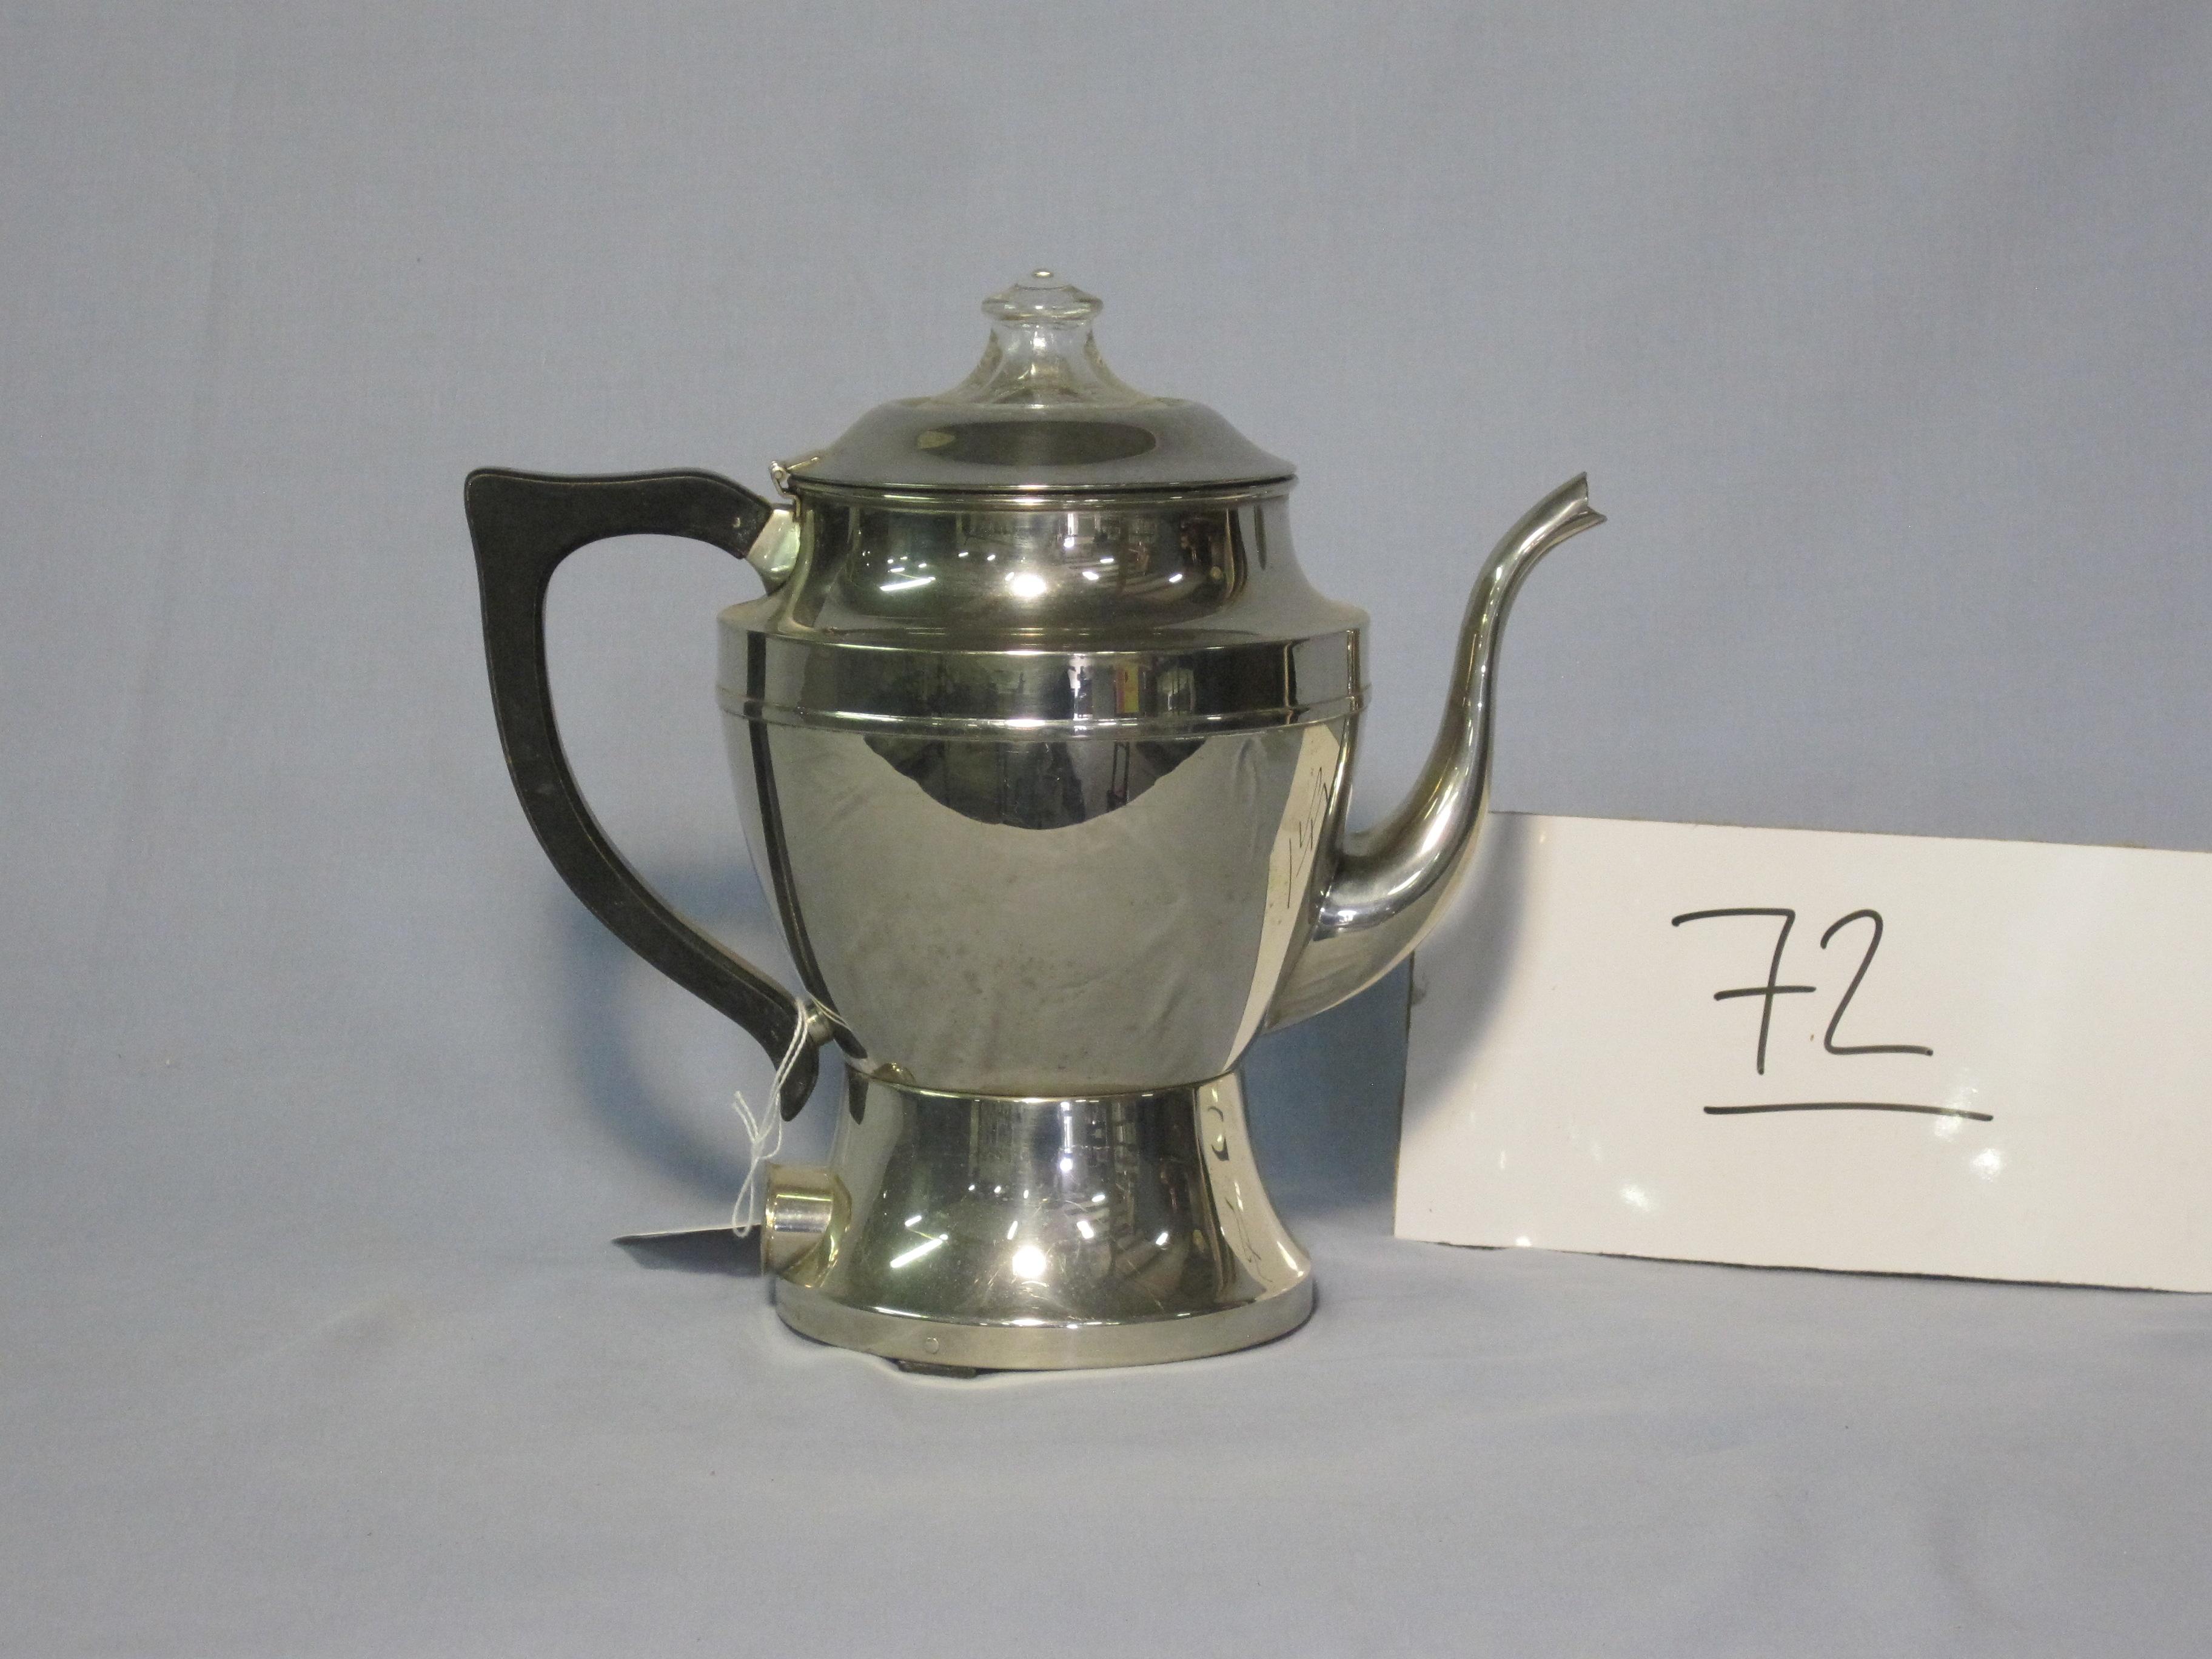 Colema electric coffee pot # 61